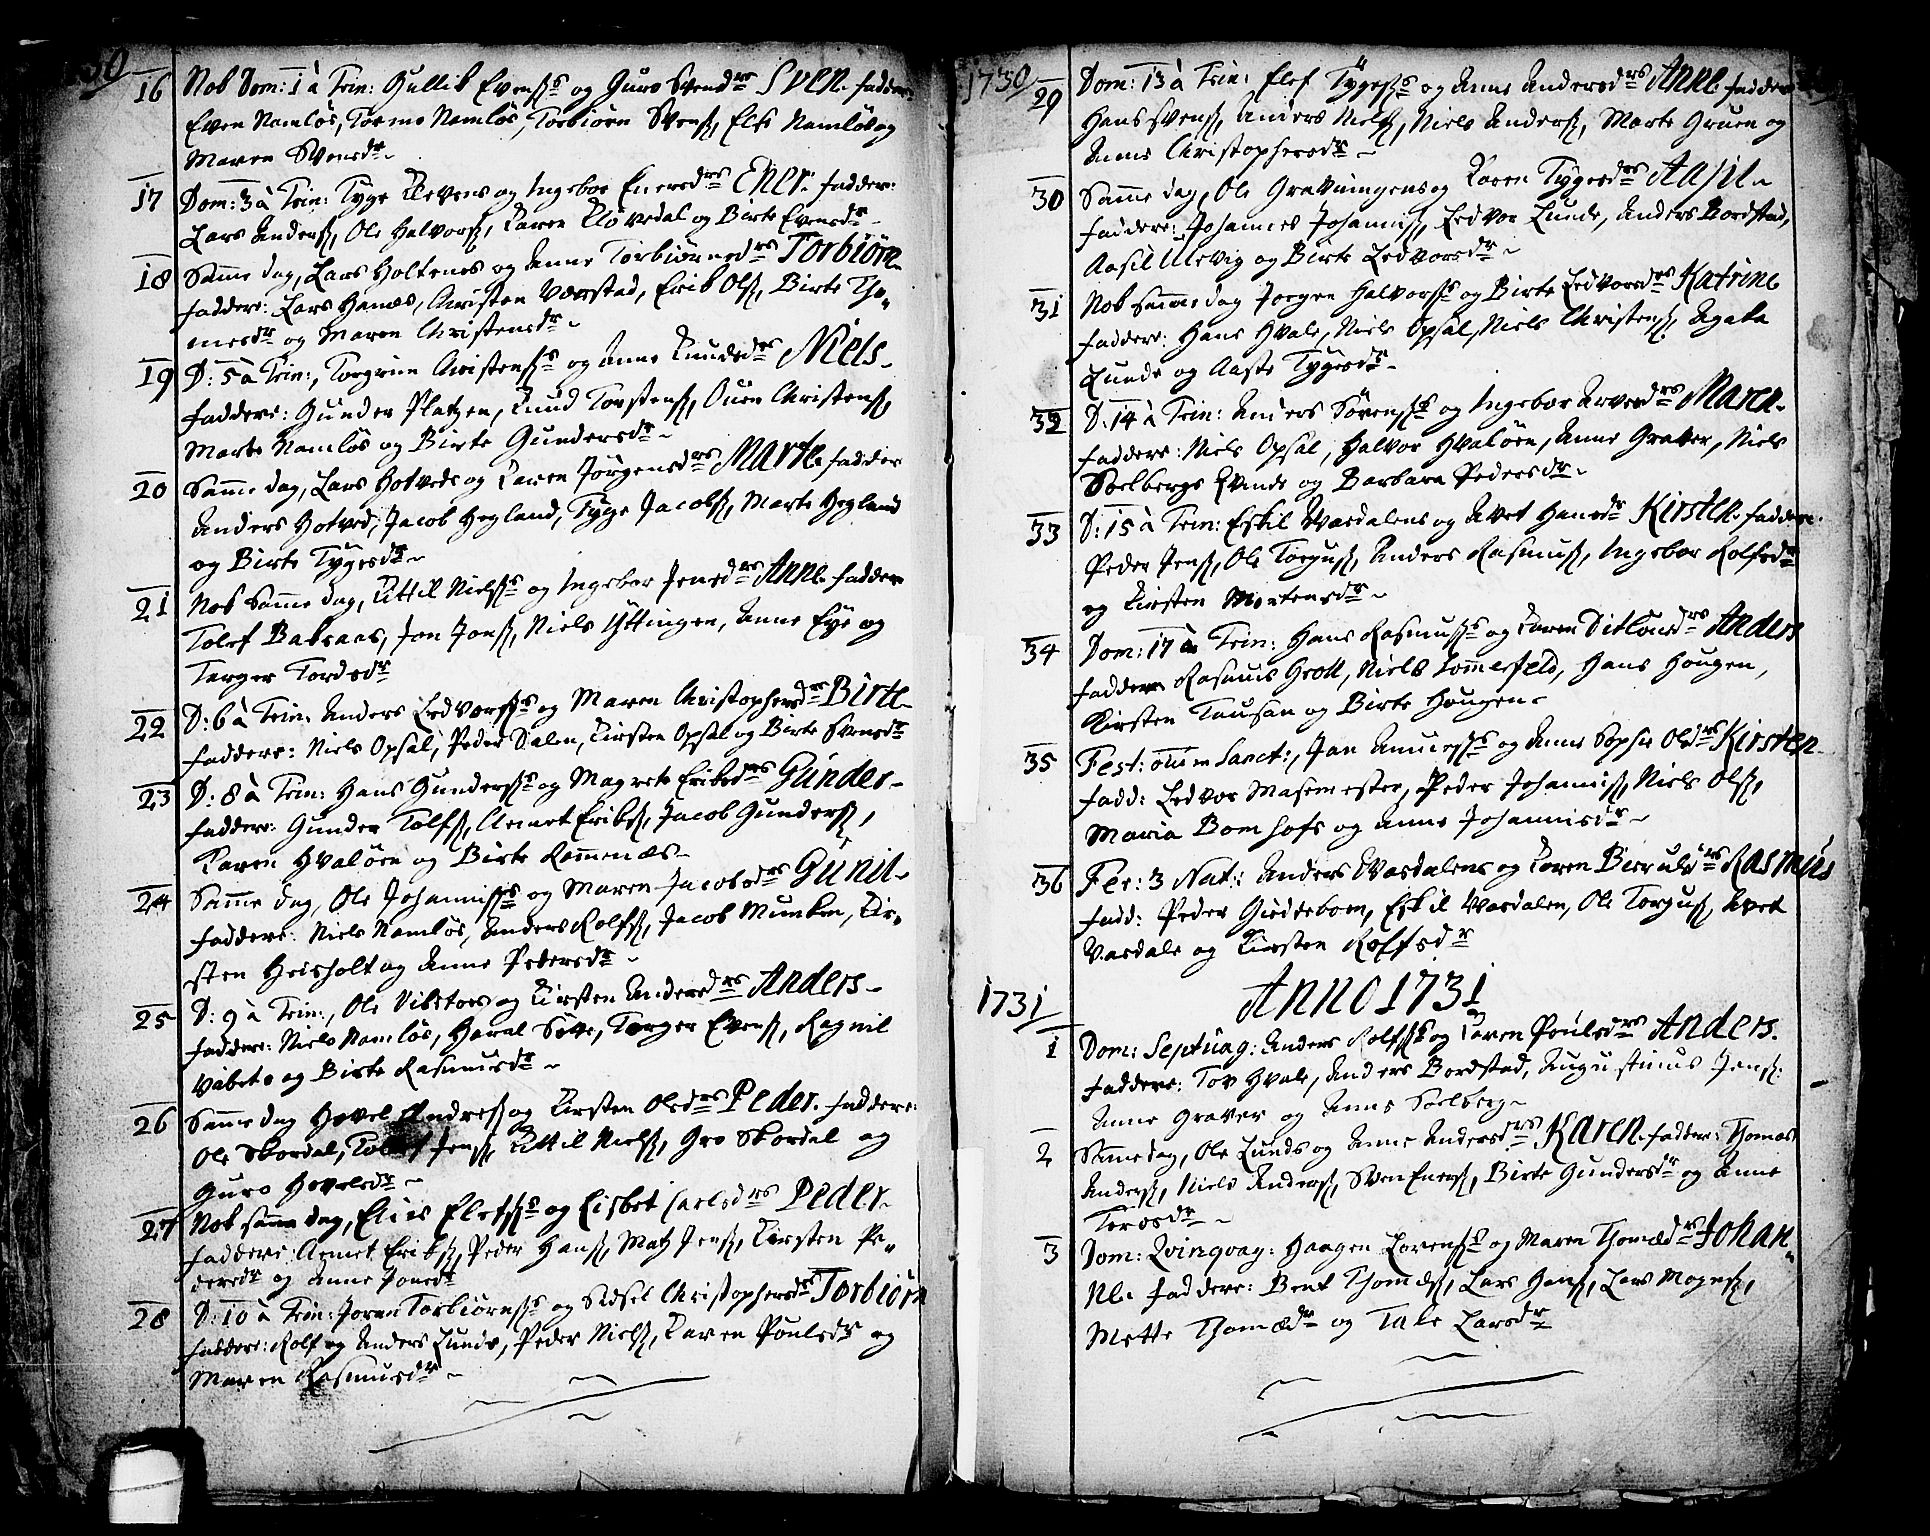 SAKO, Holla kirkebøker, F/Fa/L0001: Ministerialbok nr. 1, 1717-1779, s. 18